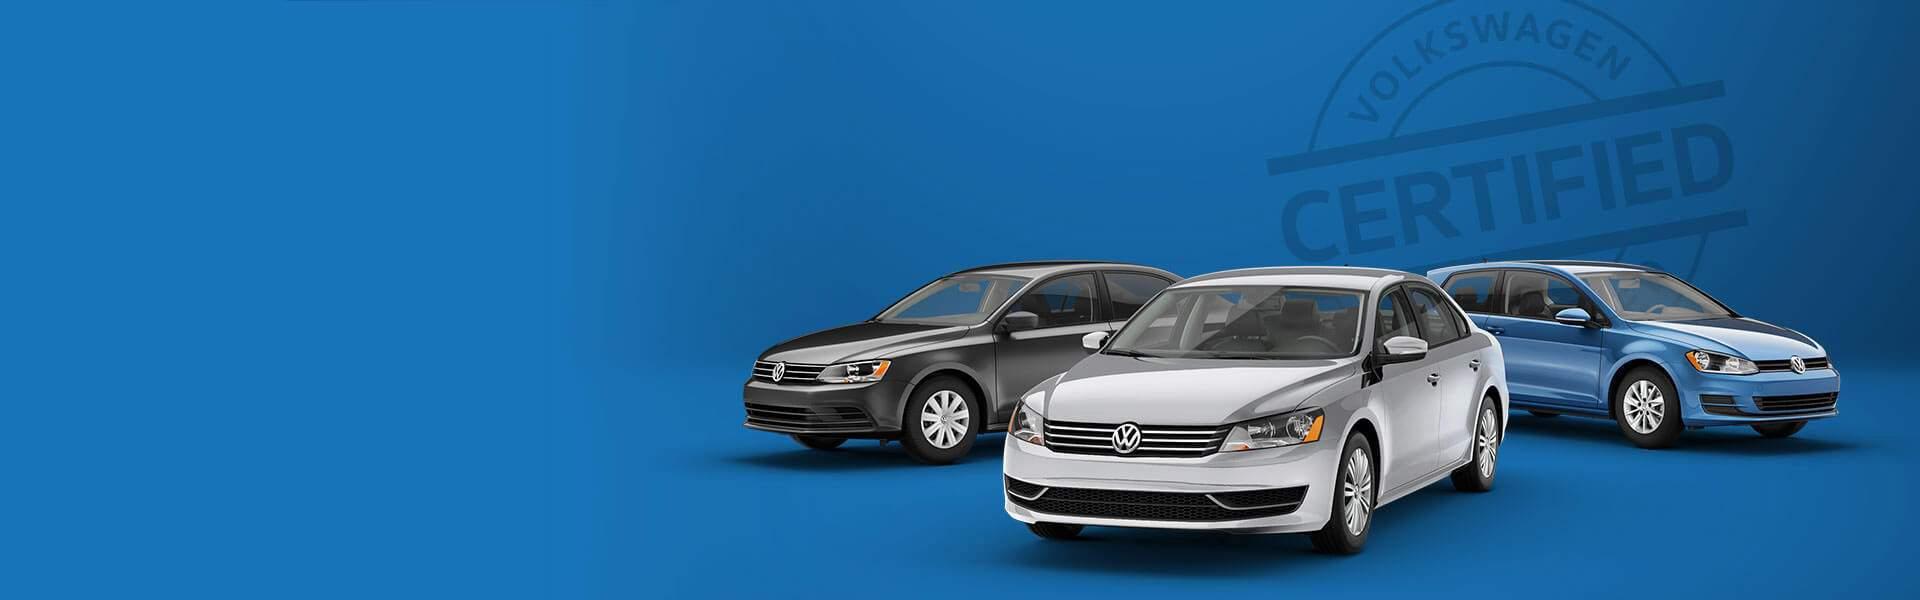 Volkswagen Certified Pre-Owned in Tampa, FL